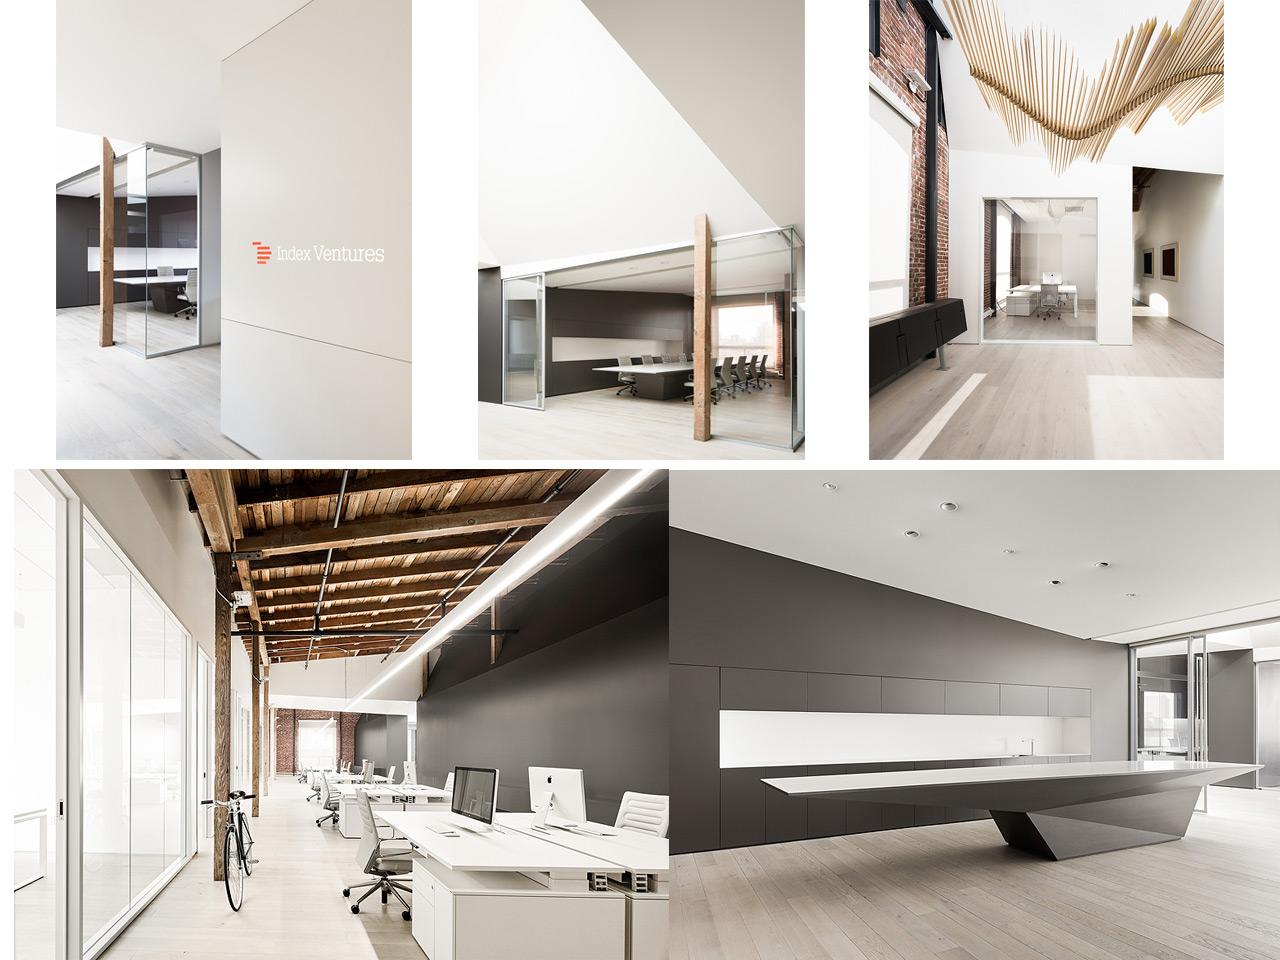 5 tendencias de arquitectura de oficinas modernas On oficinas de arquitectura